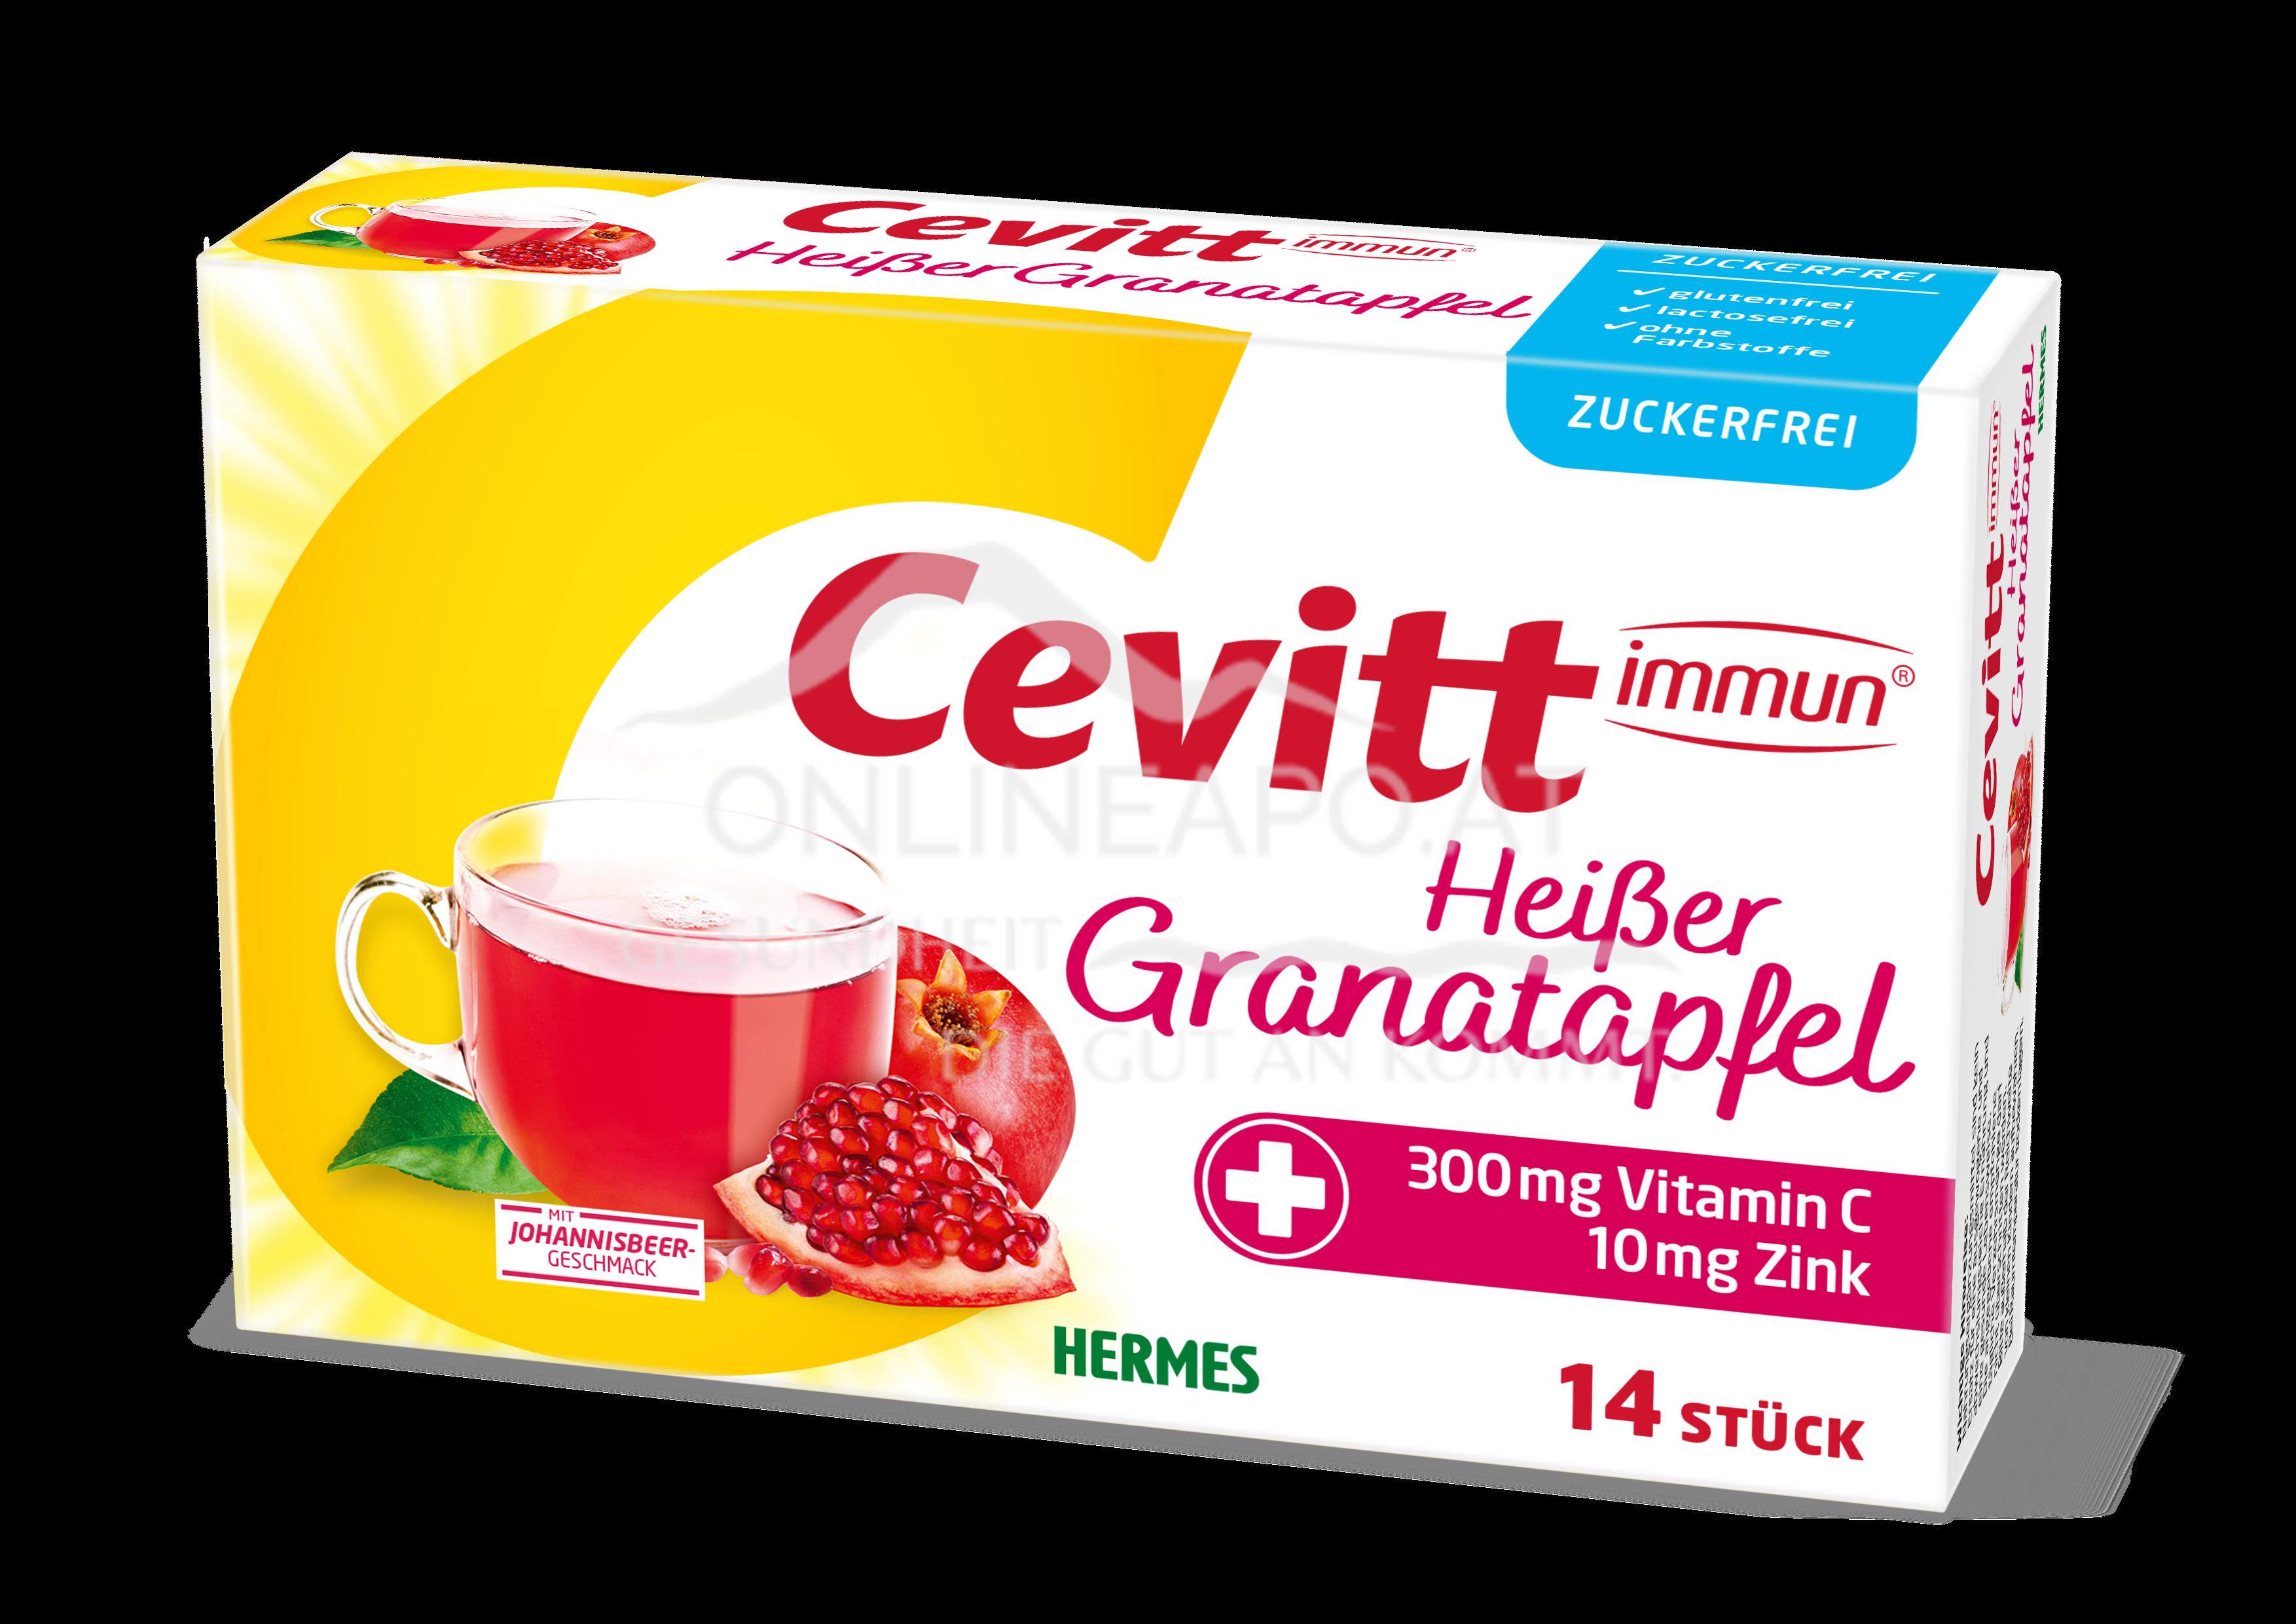 Cevitt immun® Heißer Granatapfel zuckerfrei